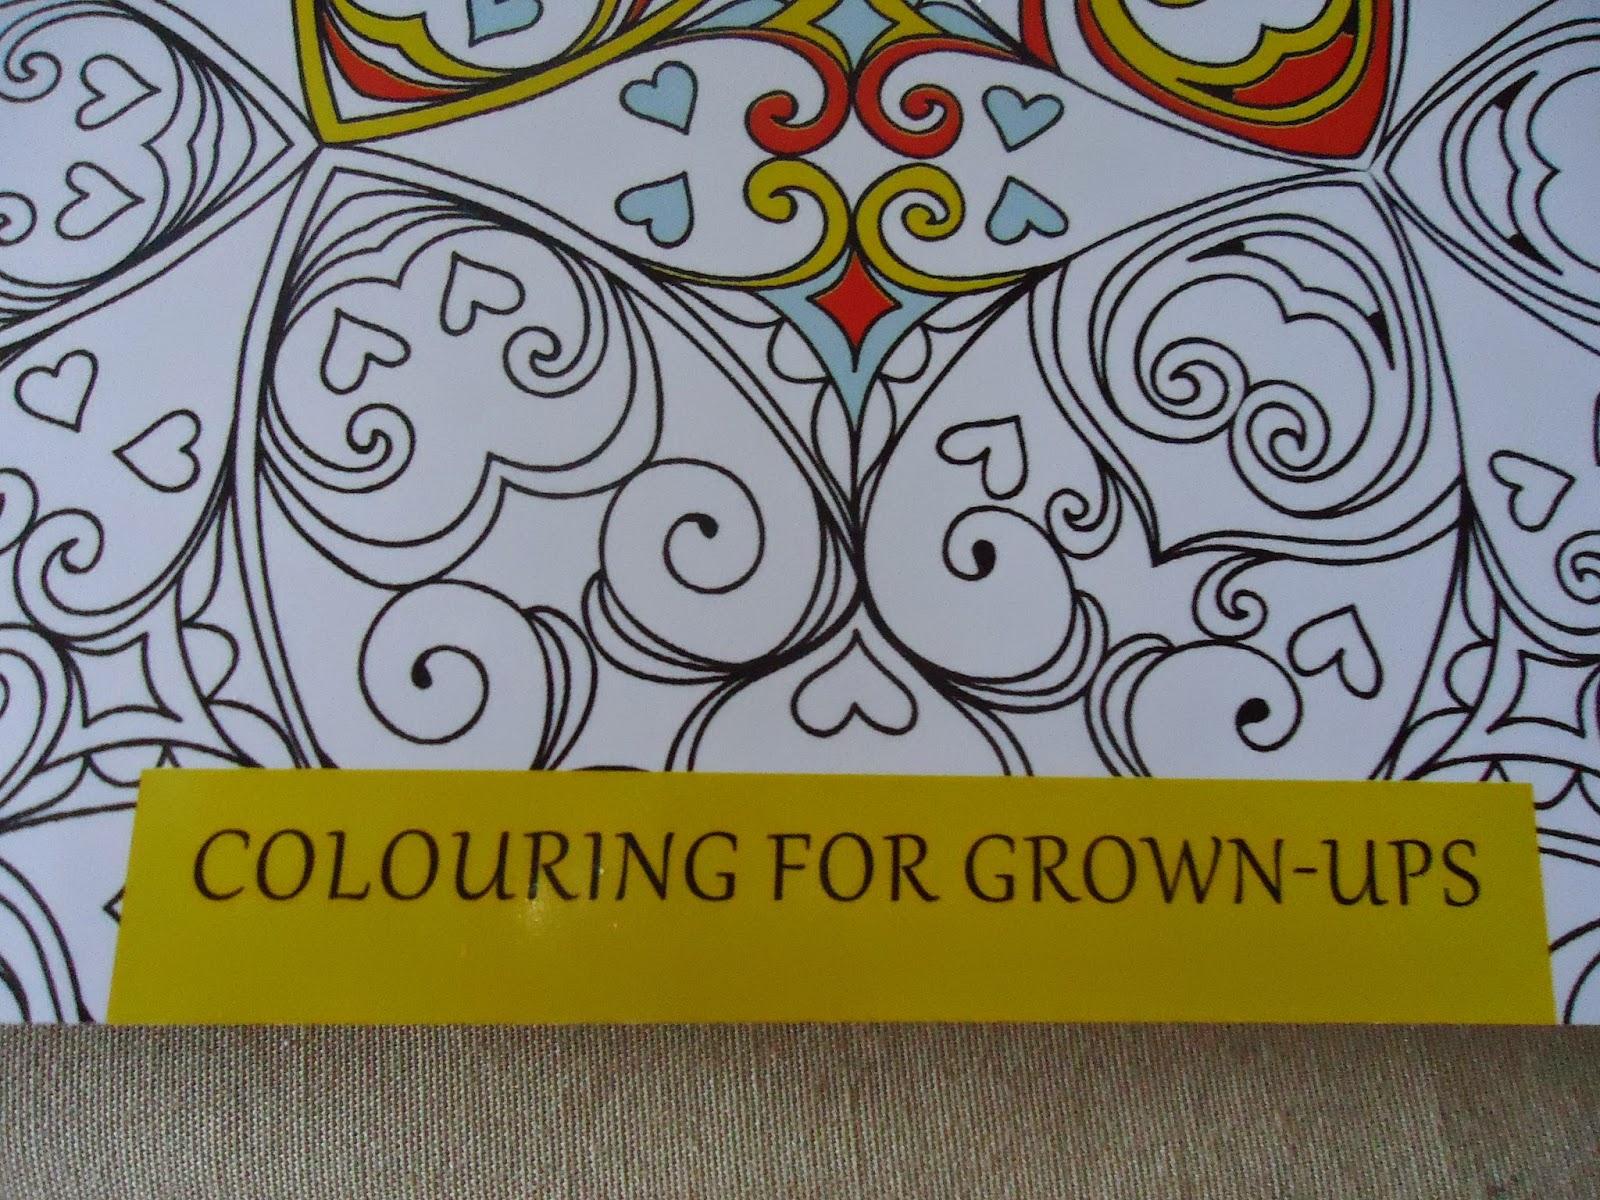 Zen colouring tesco - Zen Colouring Book Tesco I Am Looking Forward To Coloring In This Book I Think